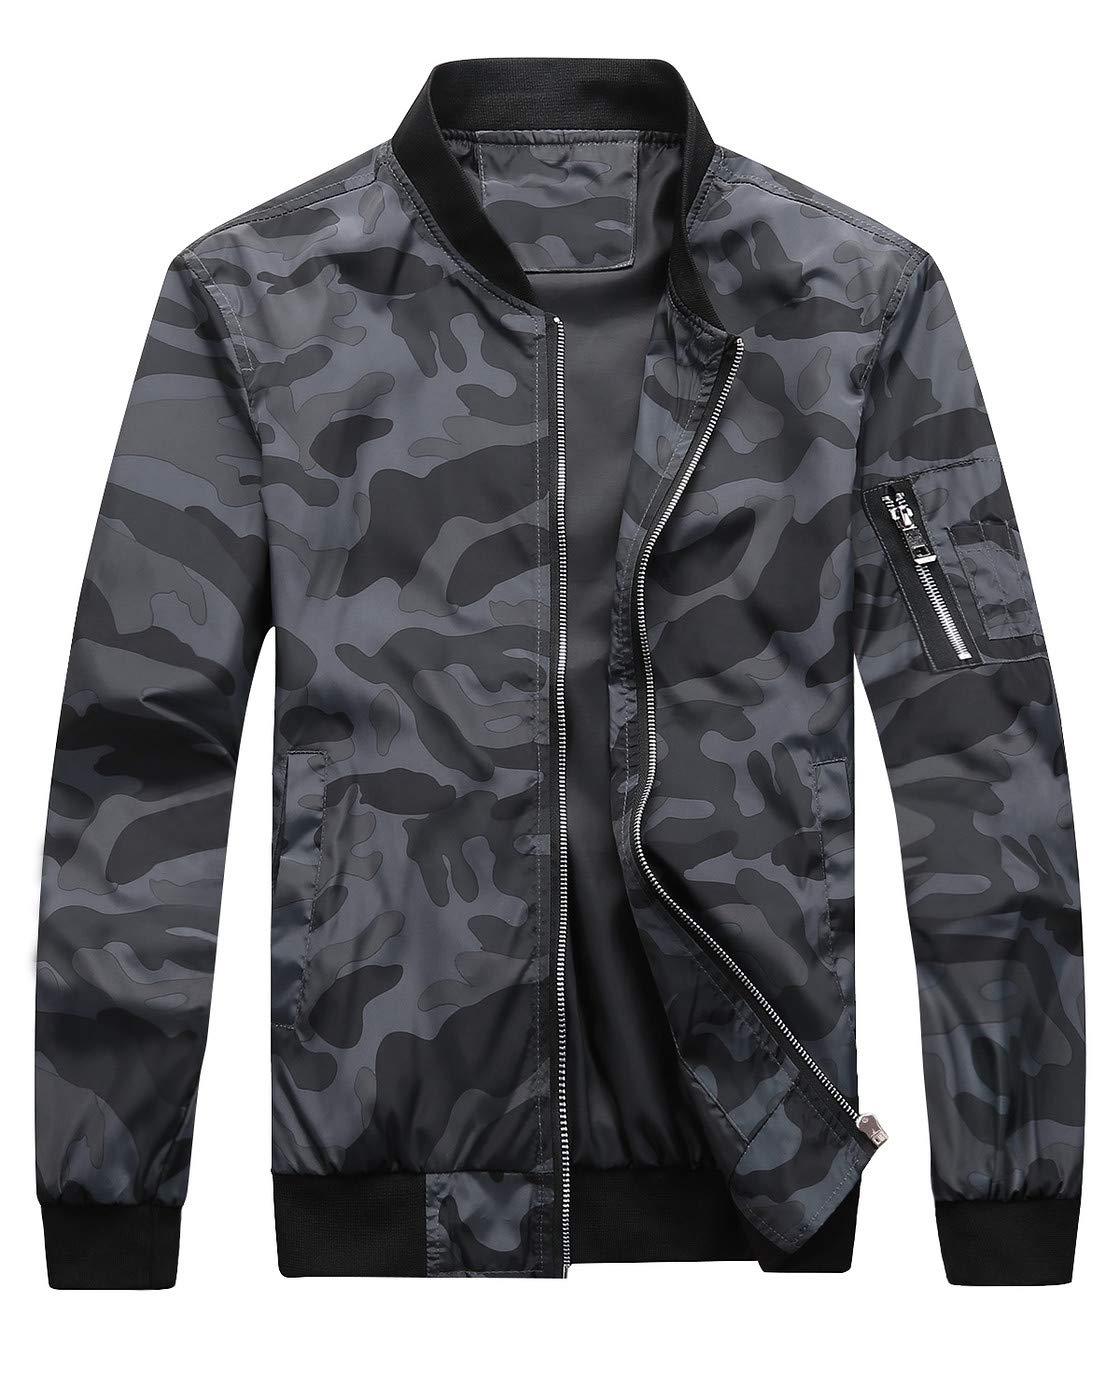 Fairylinks Bomber Jacket Men Camo Print Outwear, Black, X-Large by Fairylinks